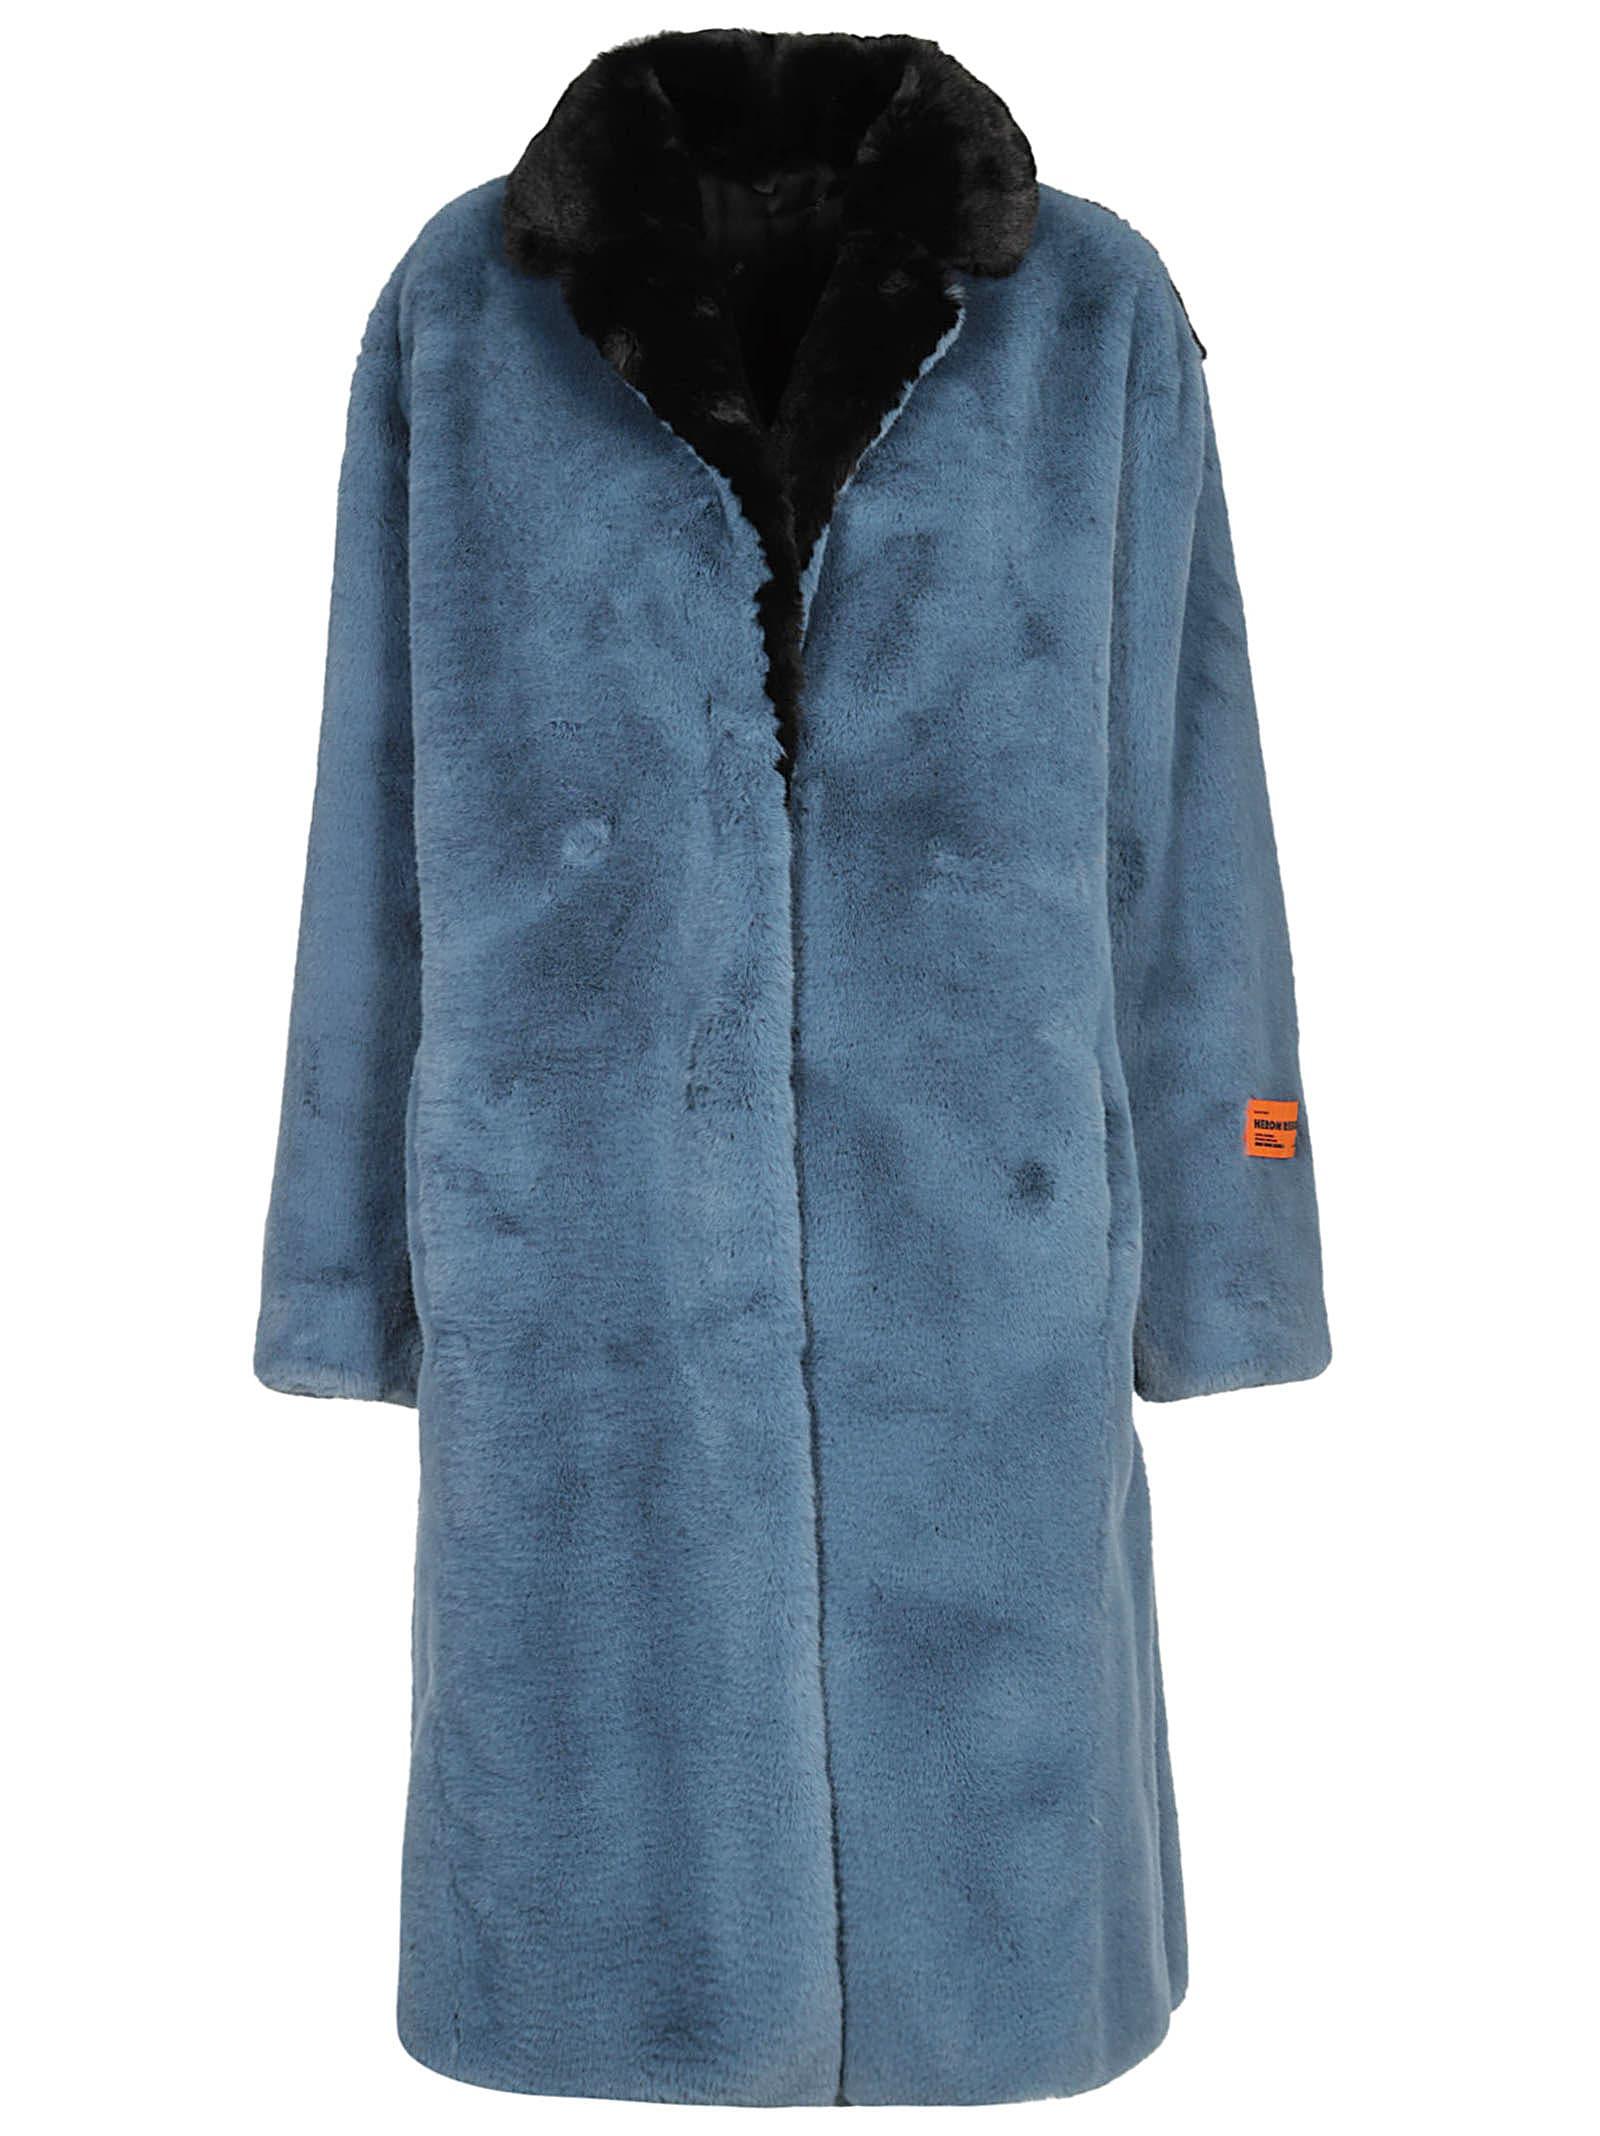 HERON PRESTON Concealed Front Coat